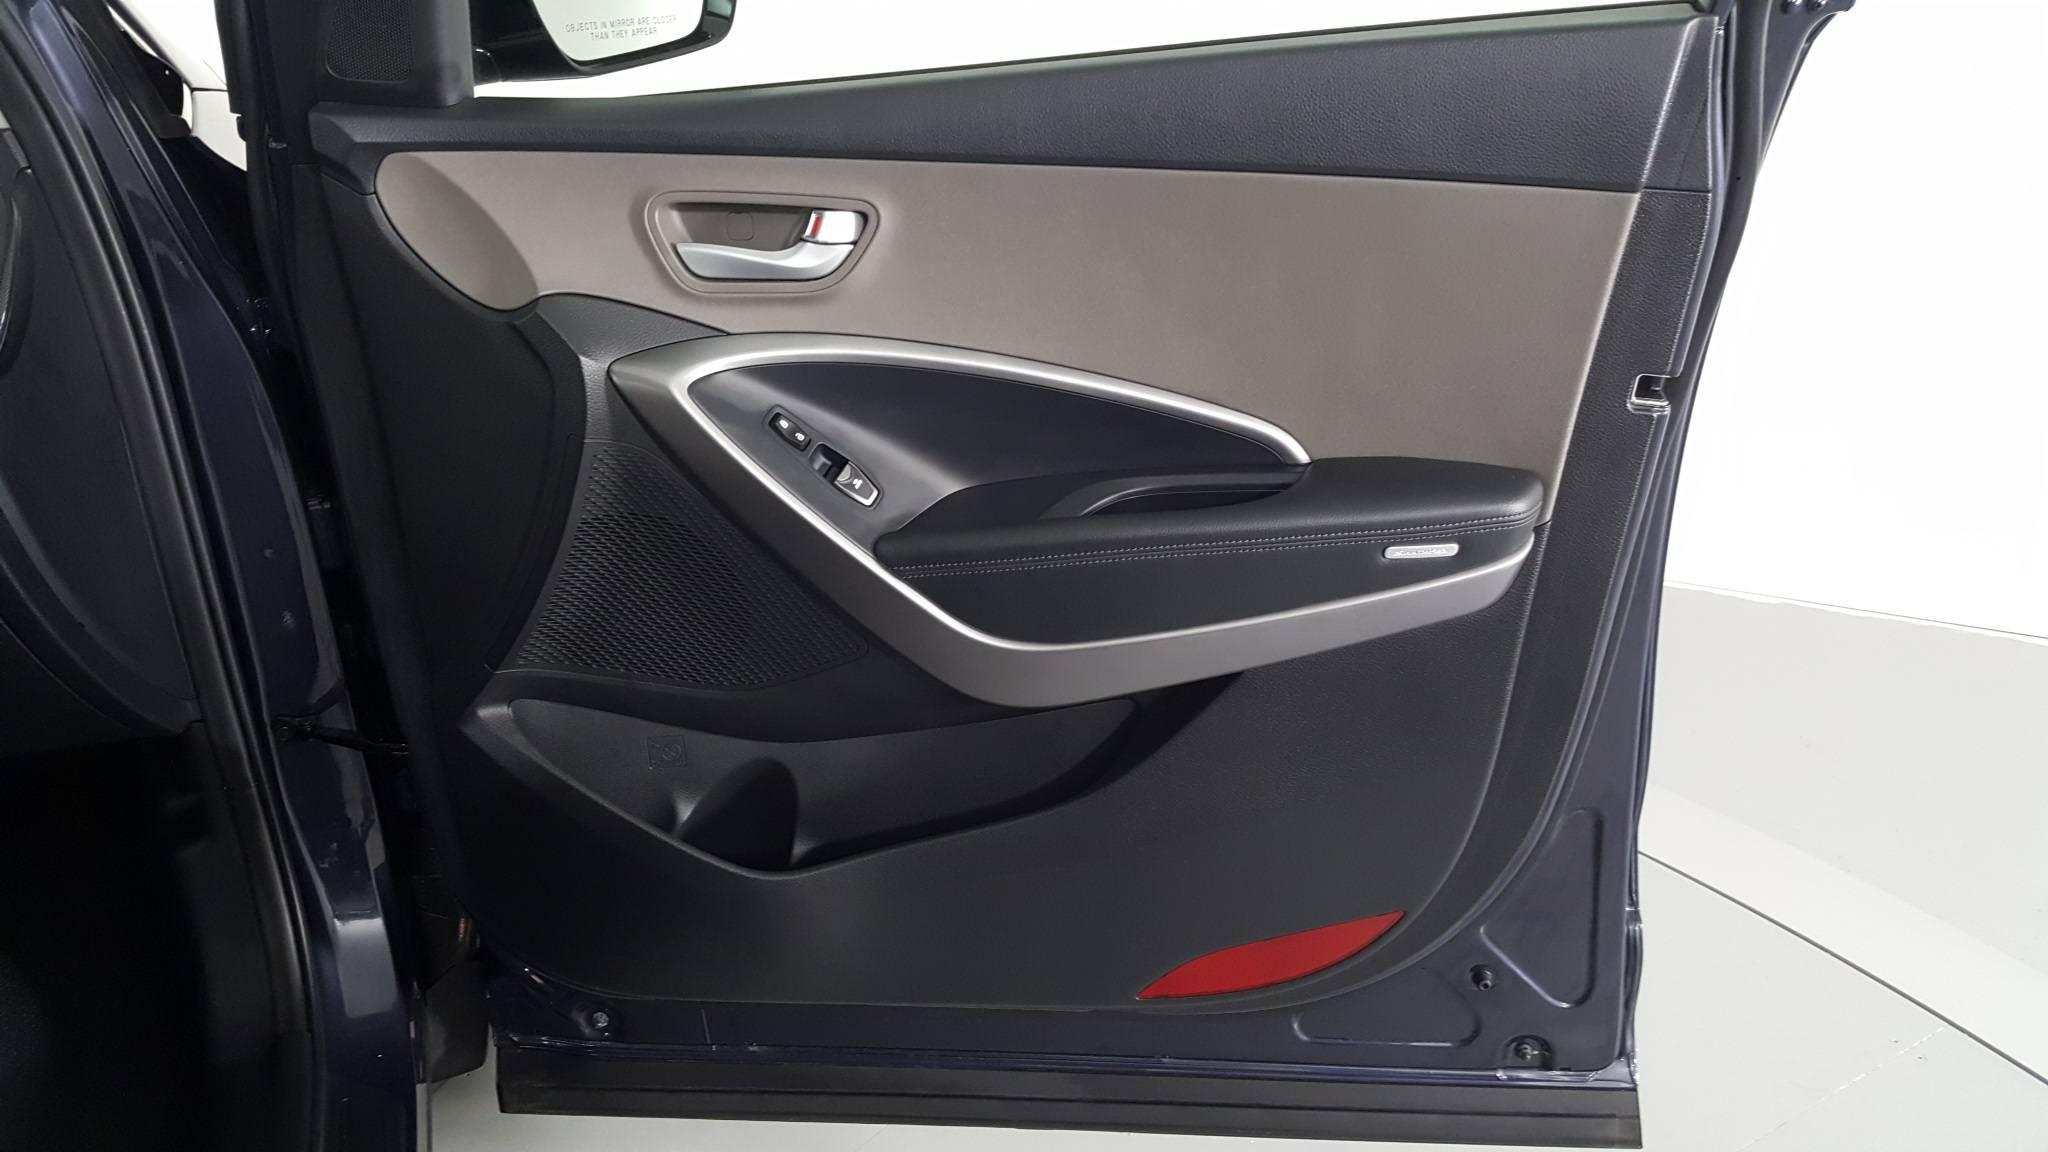 Pre-Owned 2016 Hyundai Santa Fe Sport AWD 4DR 2.4